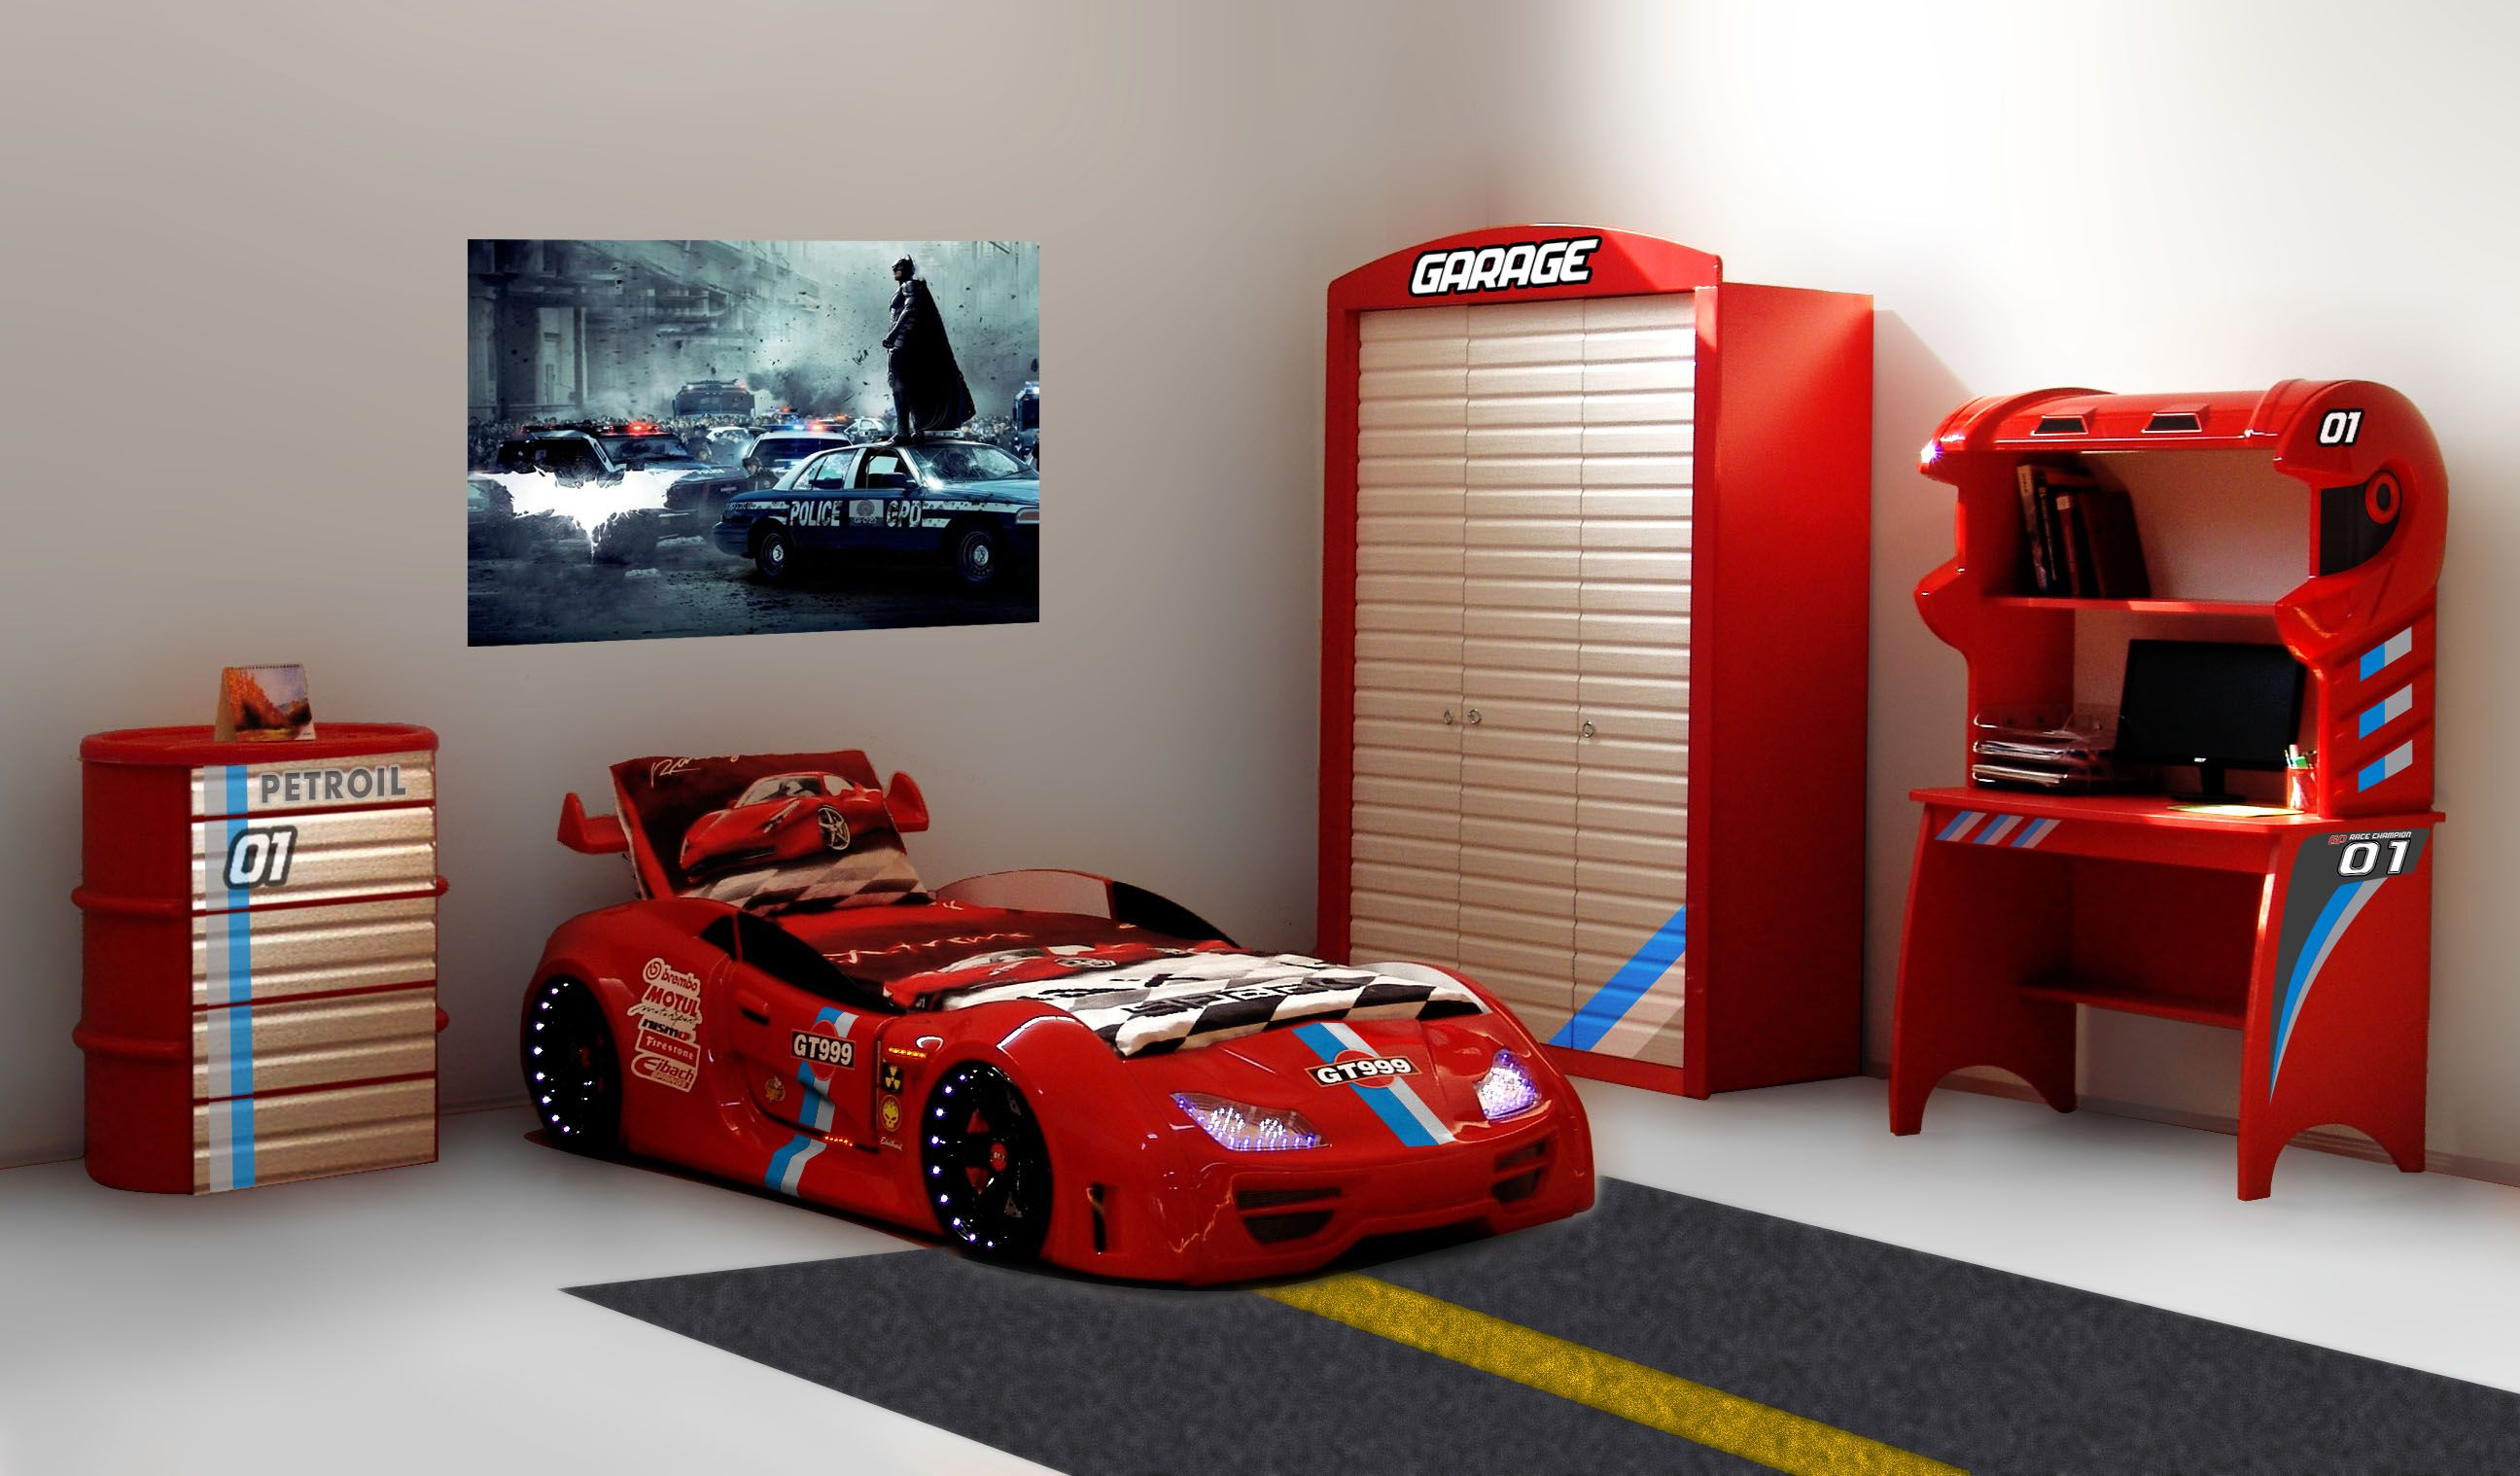 gt 999 kinderzimmer rot 4 tlg in 8 farbvarianten ist dieses flotte zimmer auf der berholspur. Black Bedroom Furniture Sets. Home Design Ideas